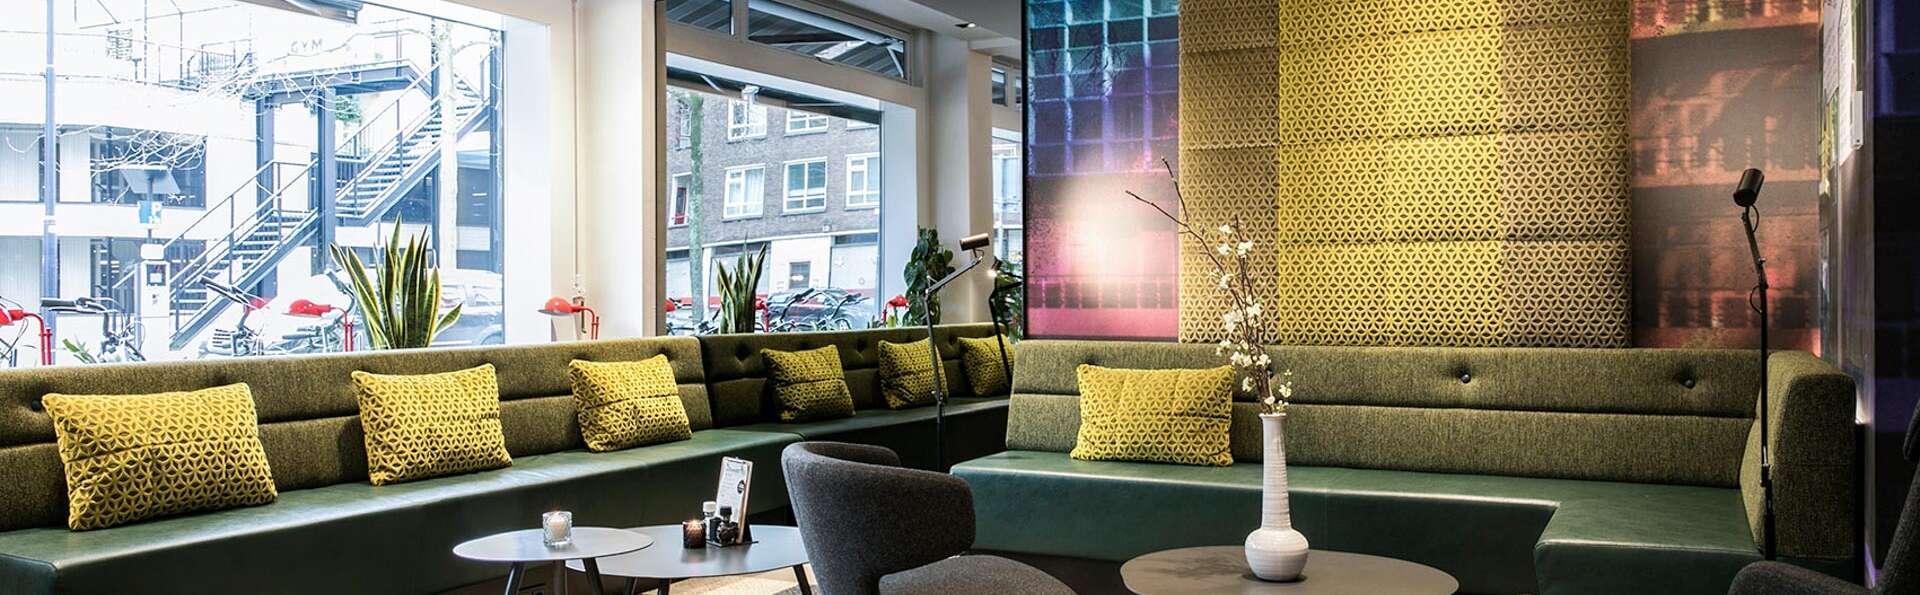 Savoy Hotel Rotterdam - EDIT_NEW_LOBBY_02.jpg